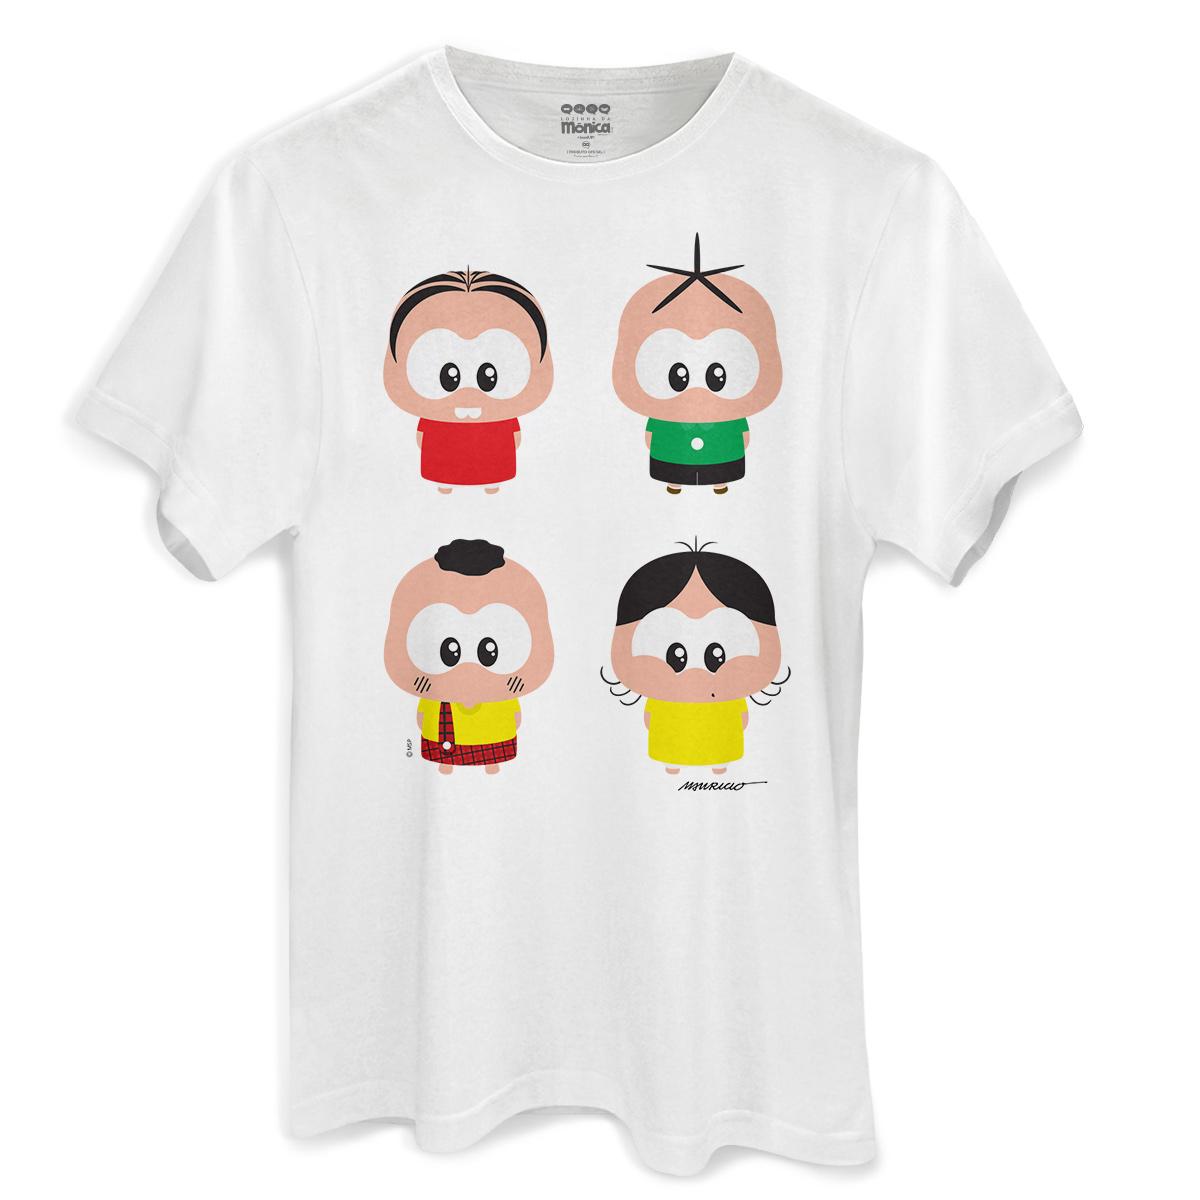 Camiseta Masculina Turma da M�nica A Turma Toy